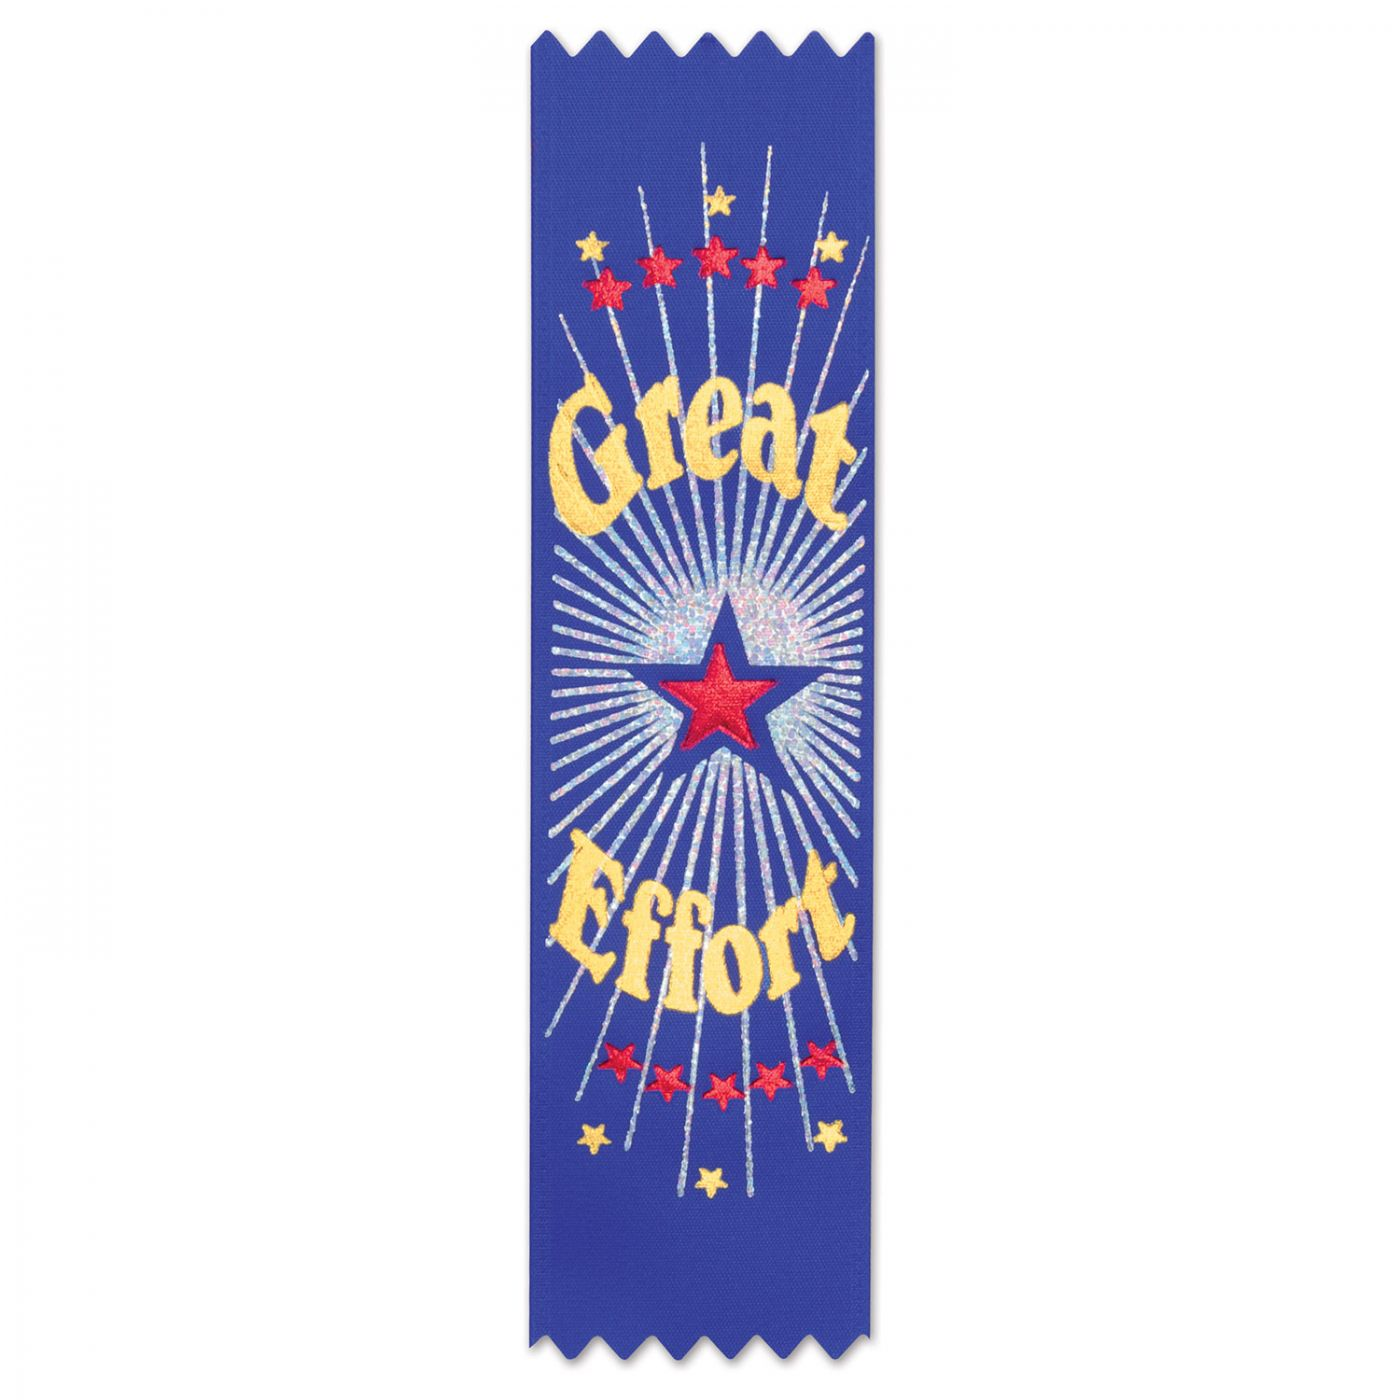 Great Effort Award Value Pack Ribbons (3) image